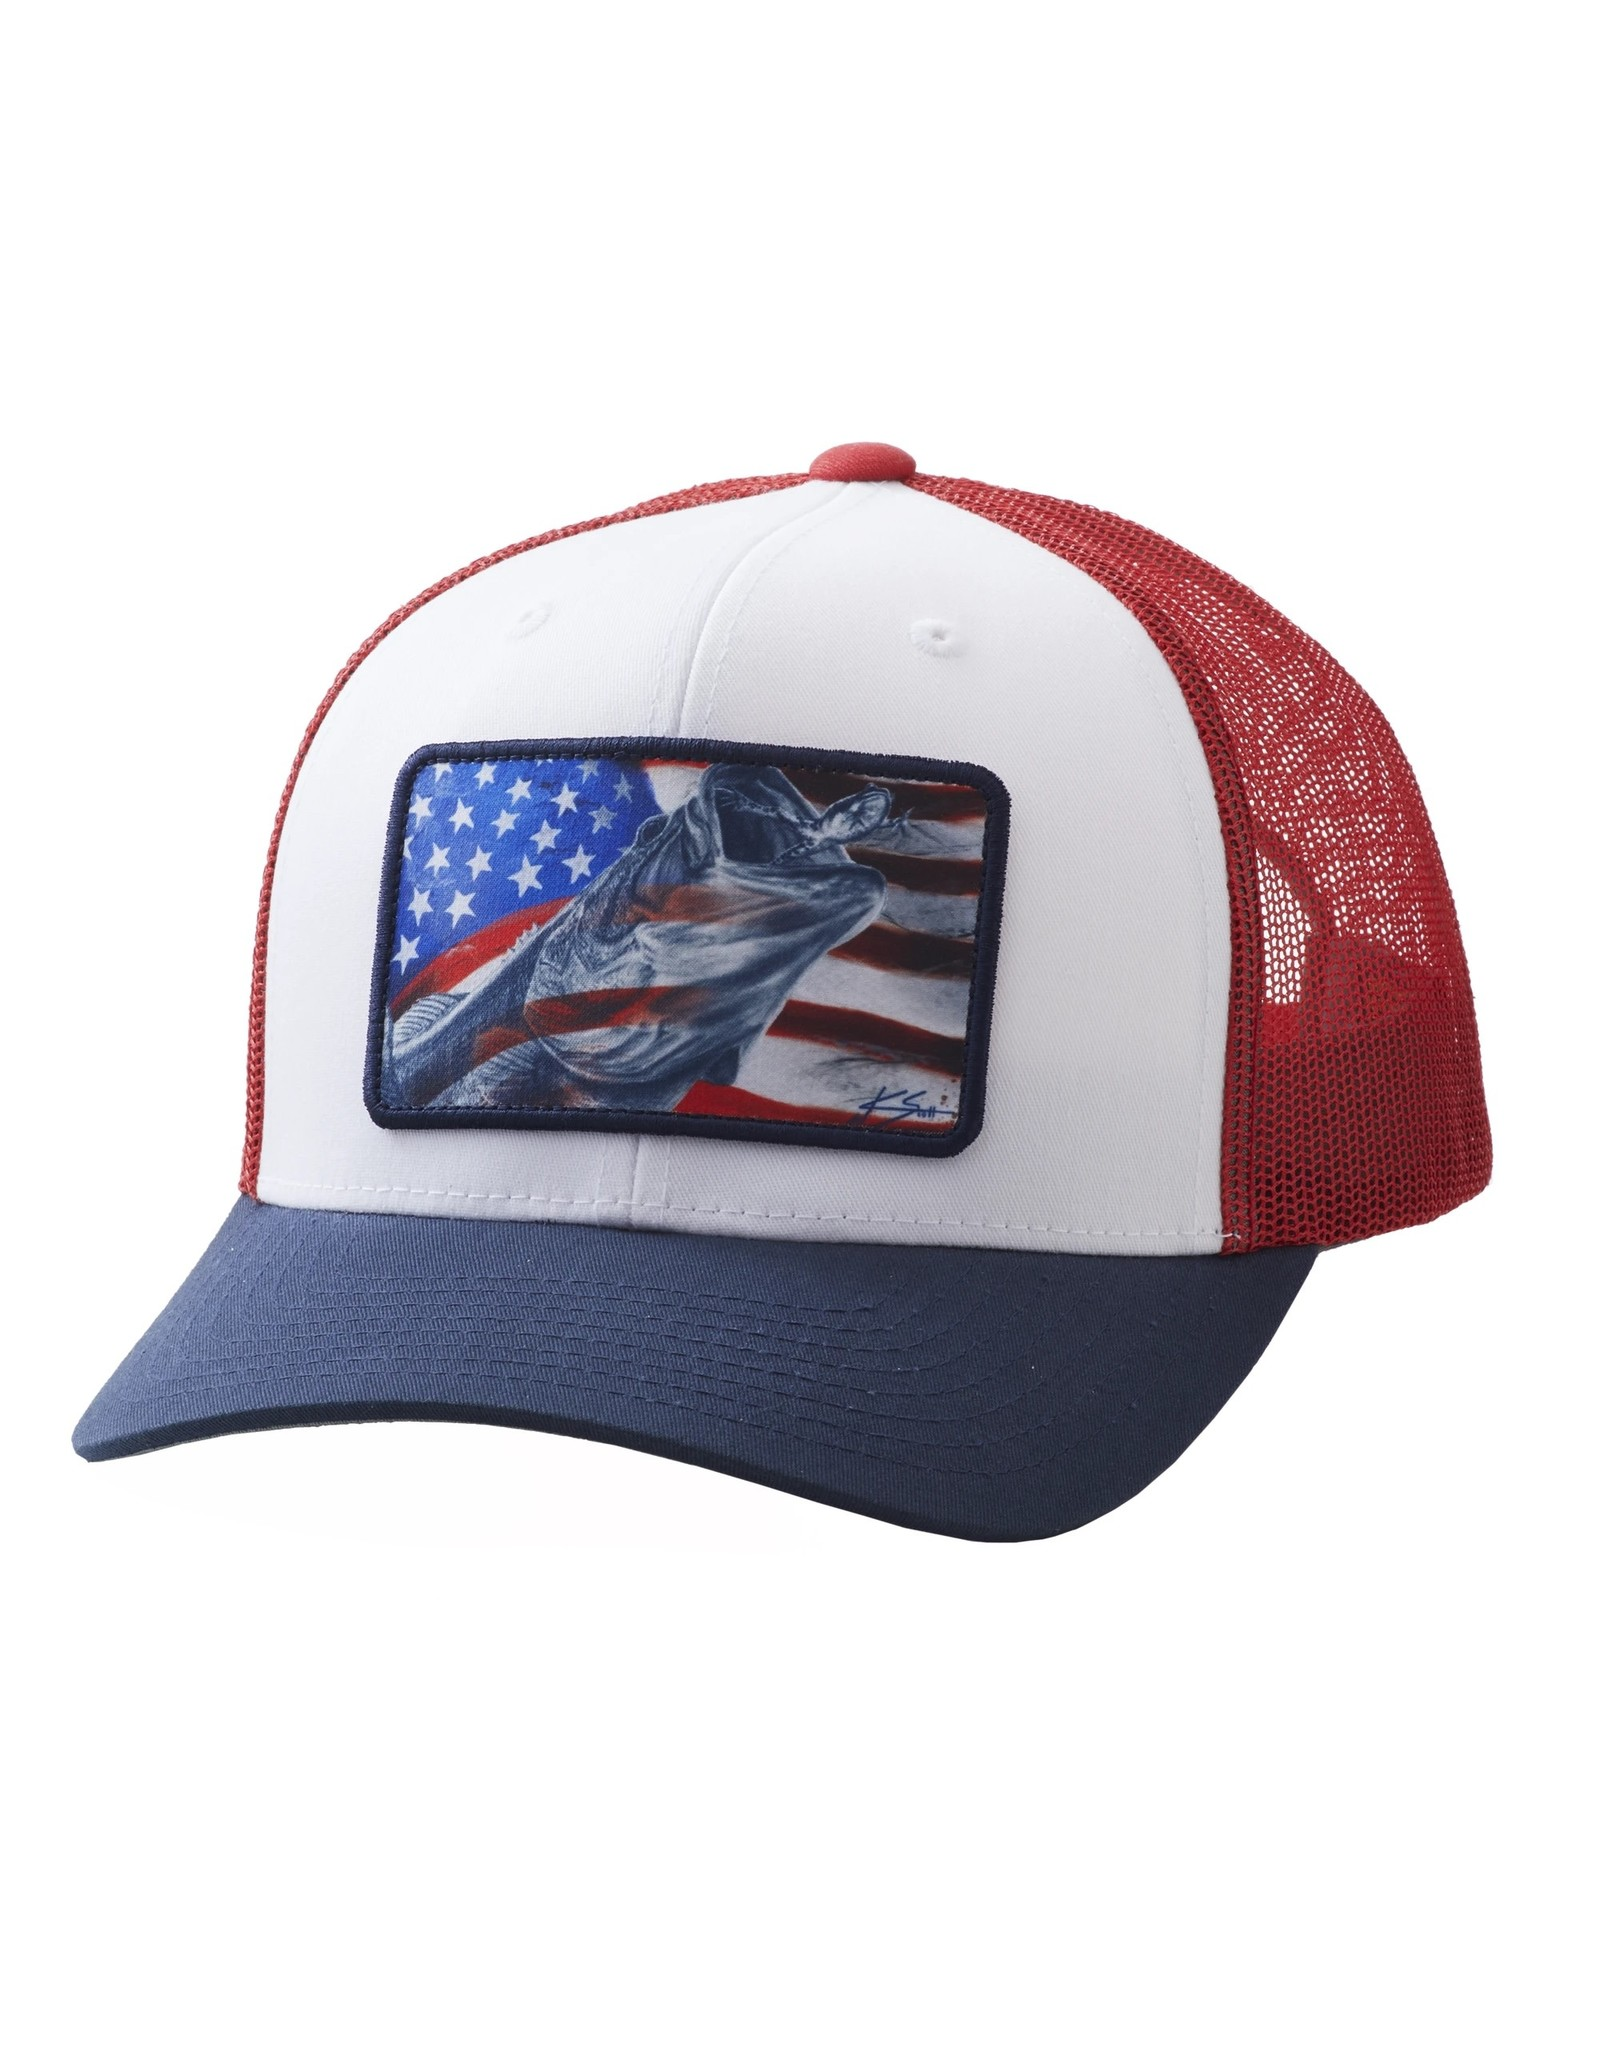 Huk Gear Huk Americana Frogger Trucker Hat